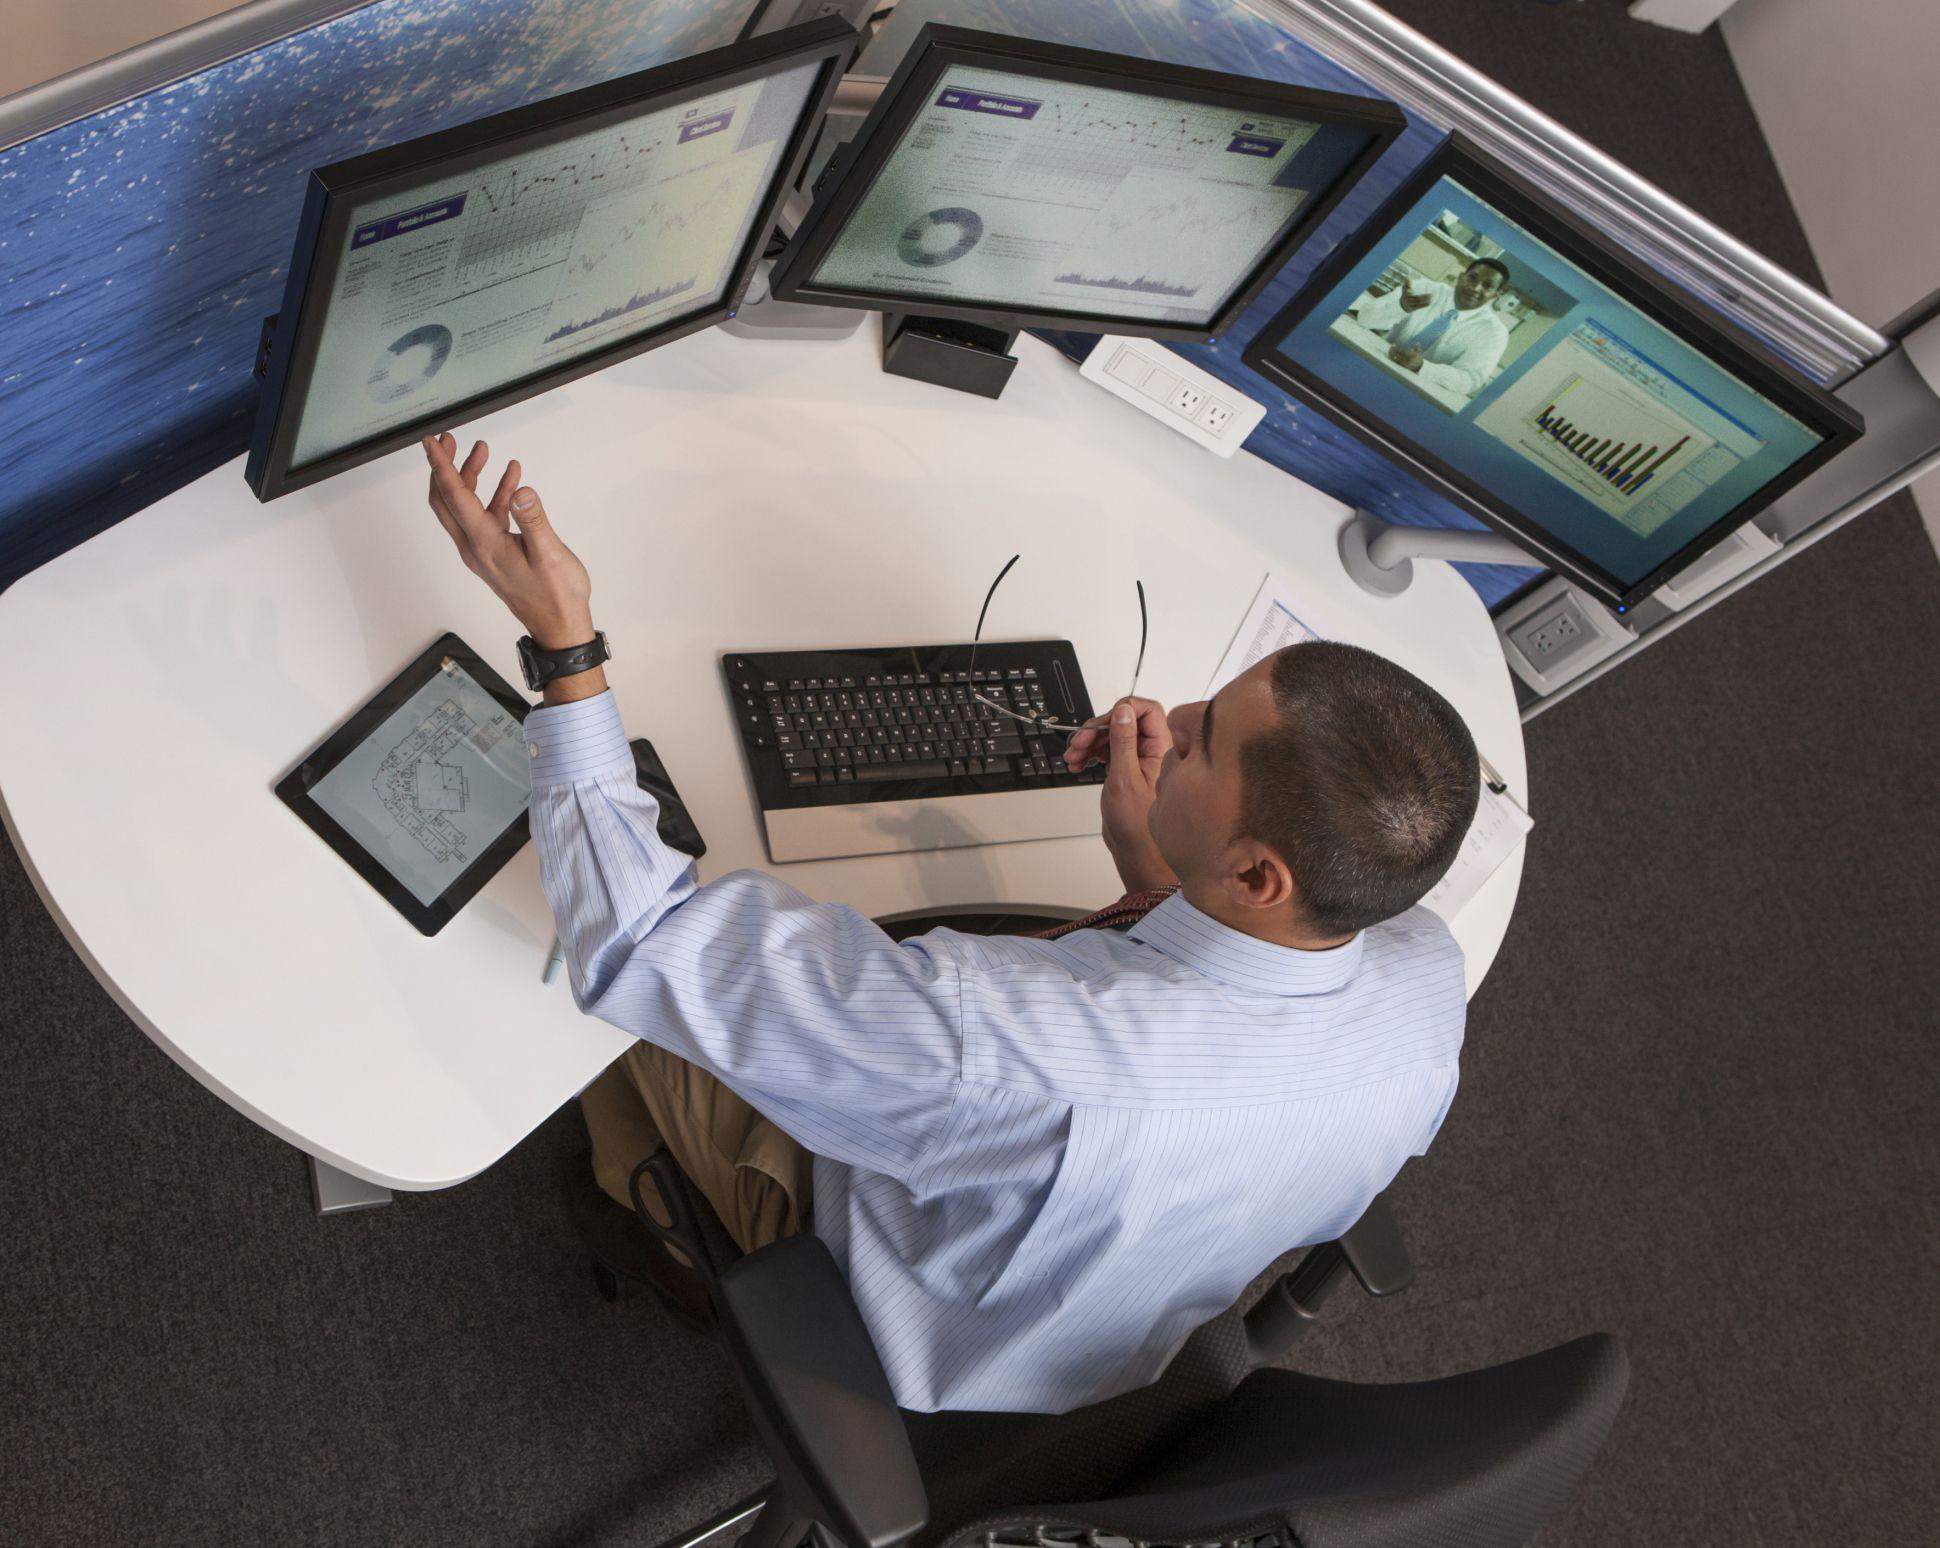 business intelligence skills resume keywords